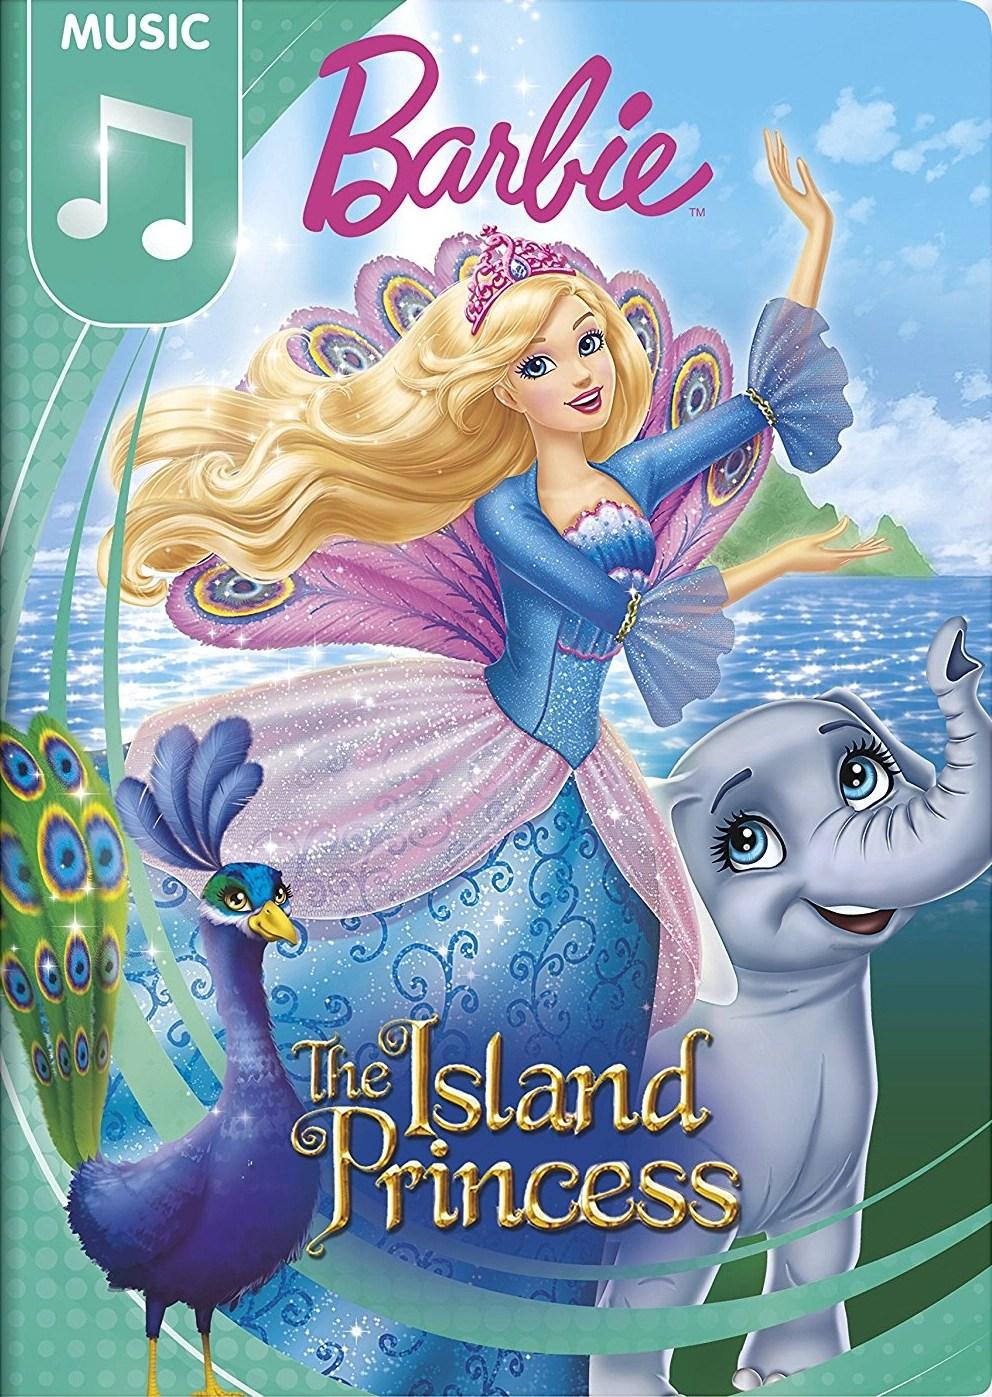 Animated Barbie Wallpaper Barbie As The Island Princess Movie Barbie Wiki